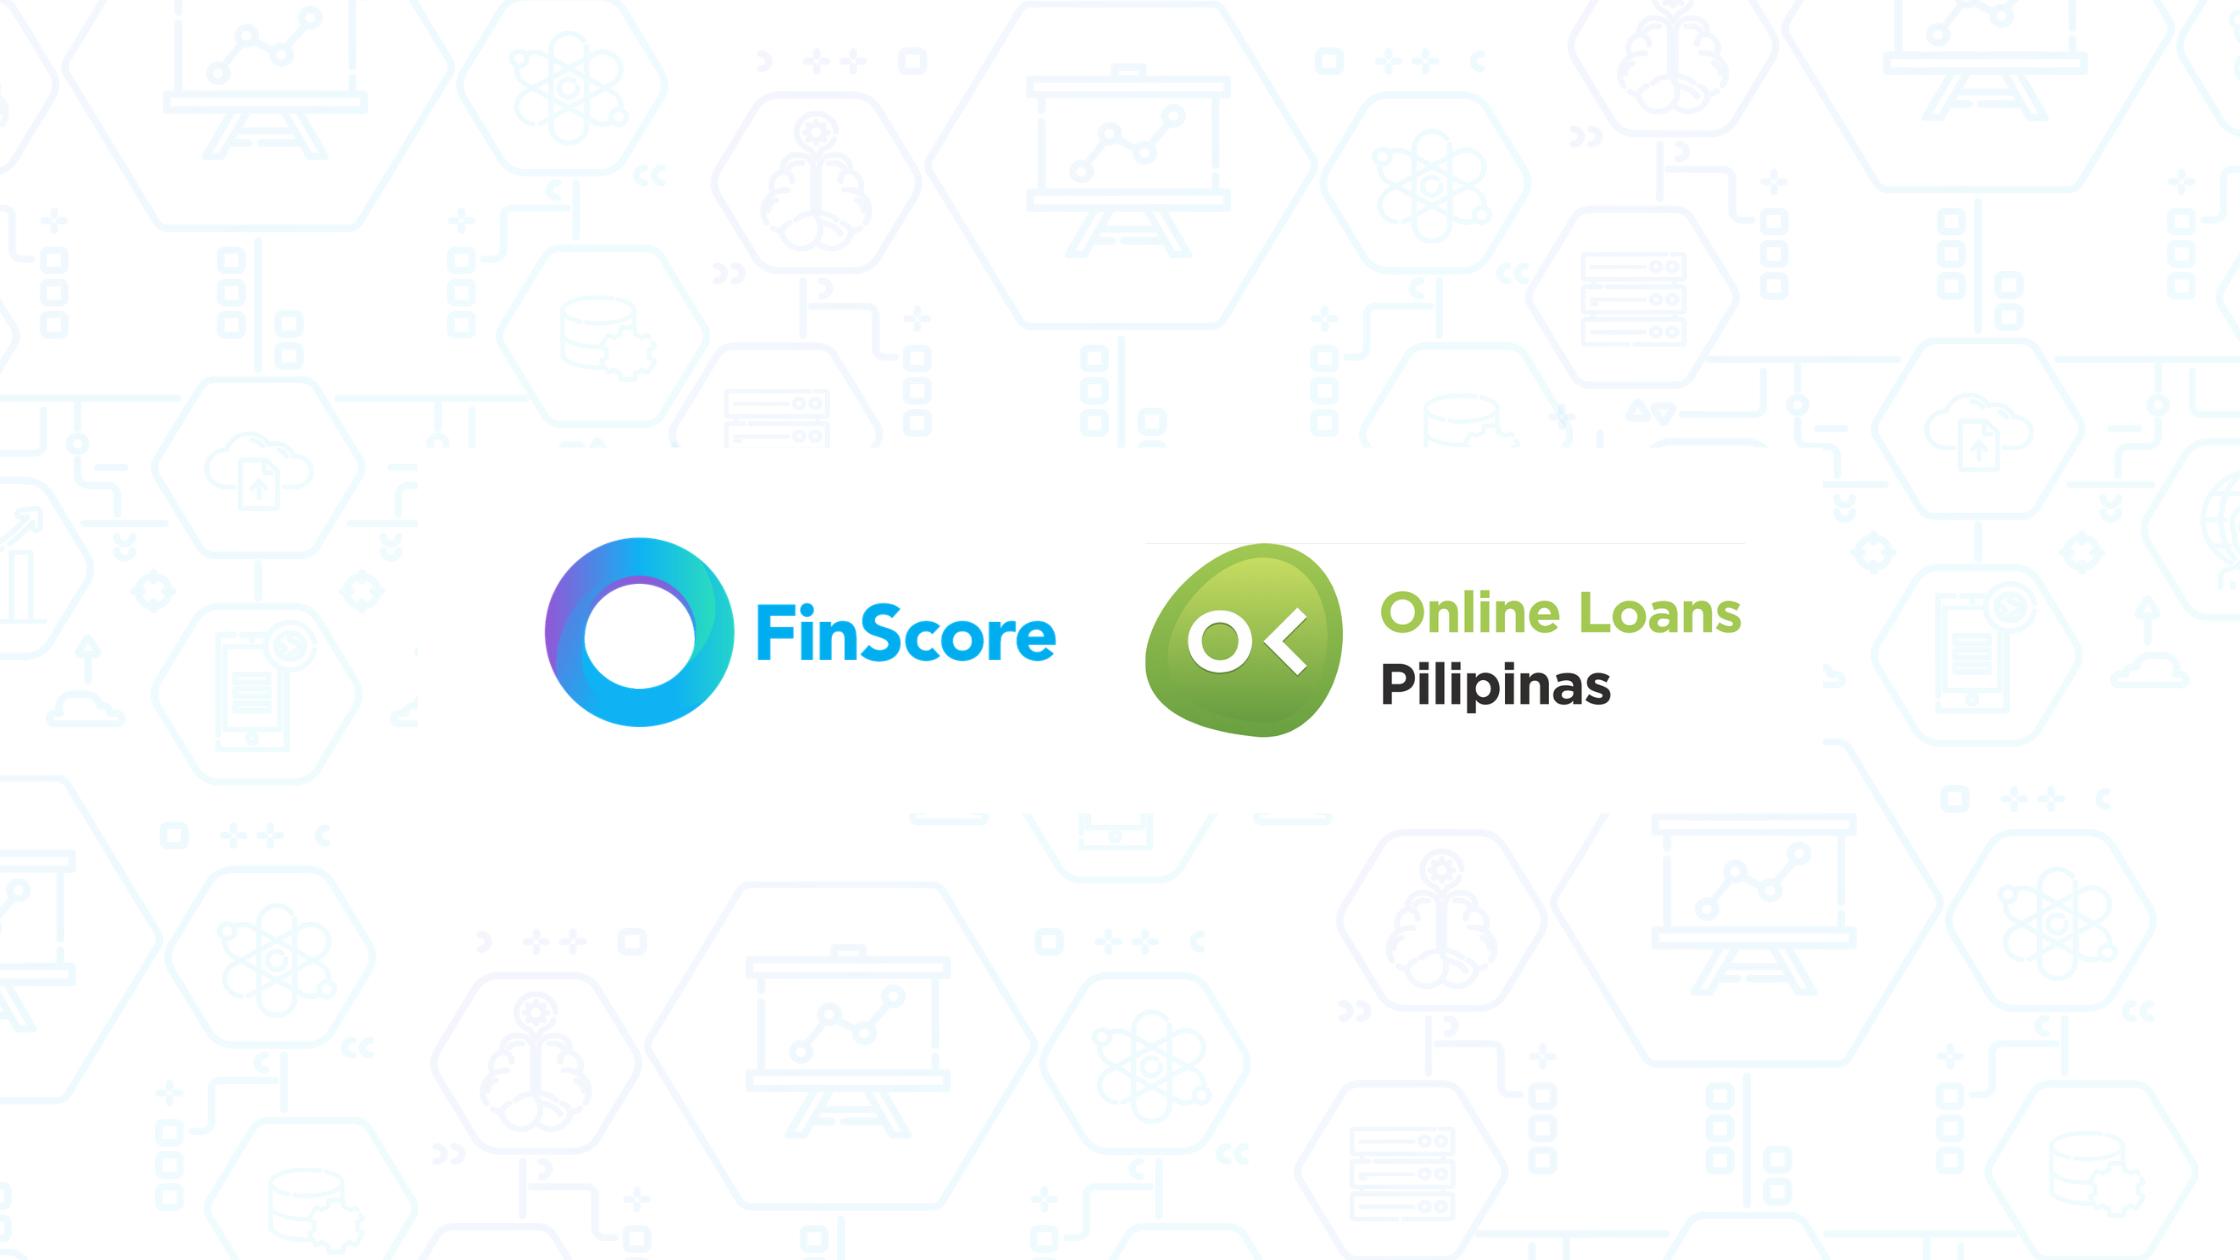 FinScore Online Loans Pilipinas Partnership